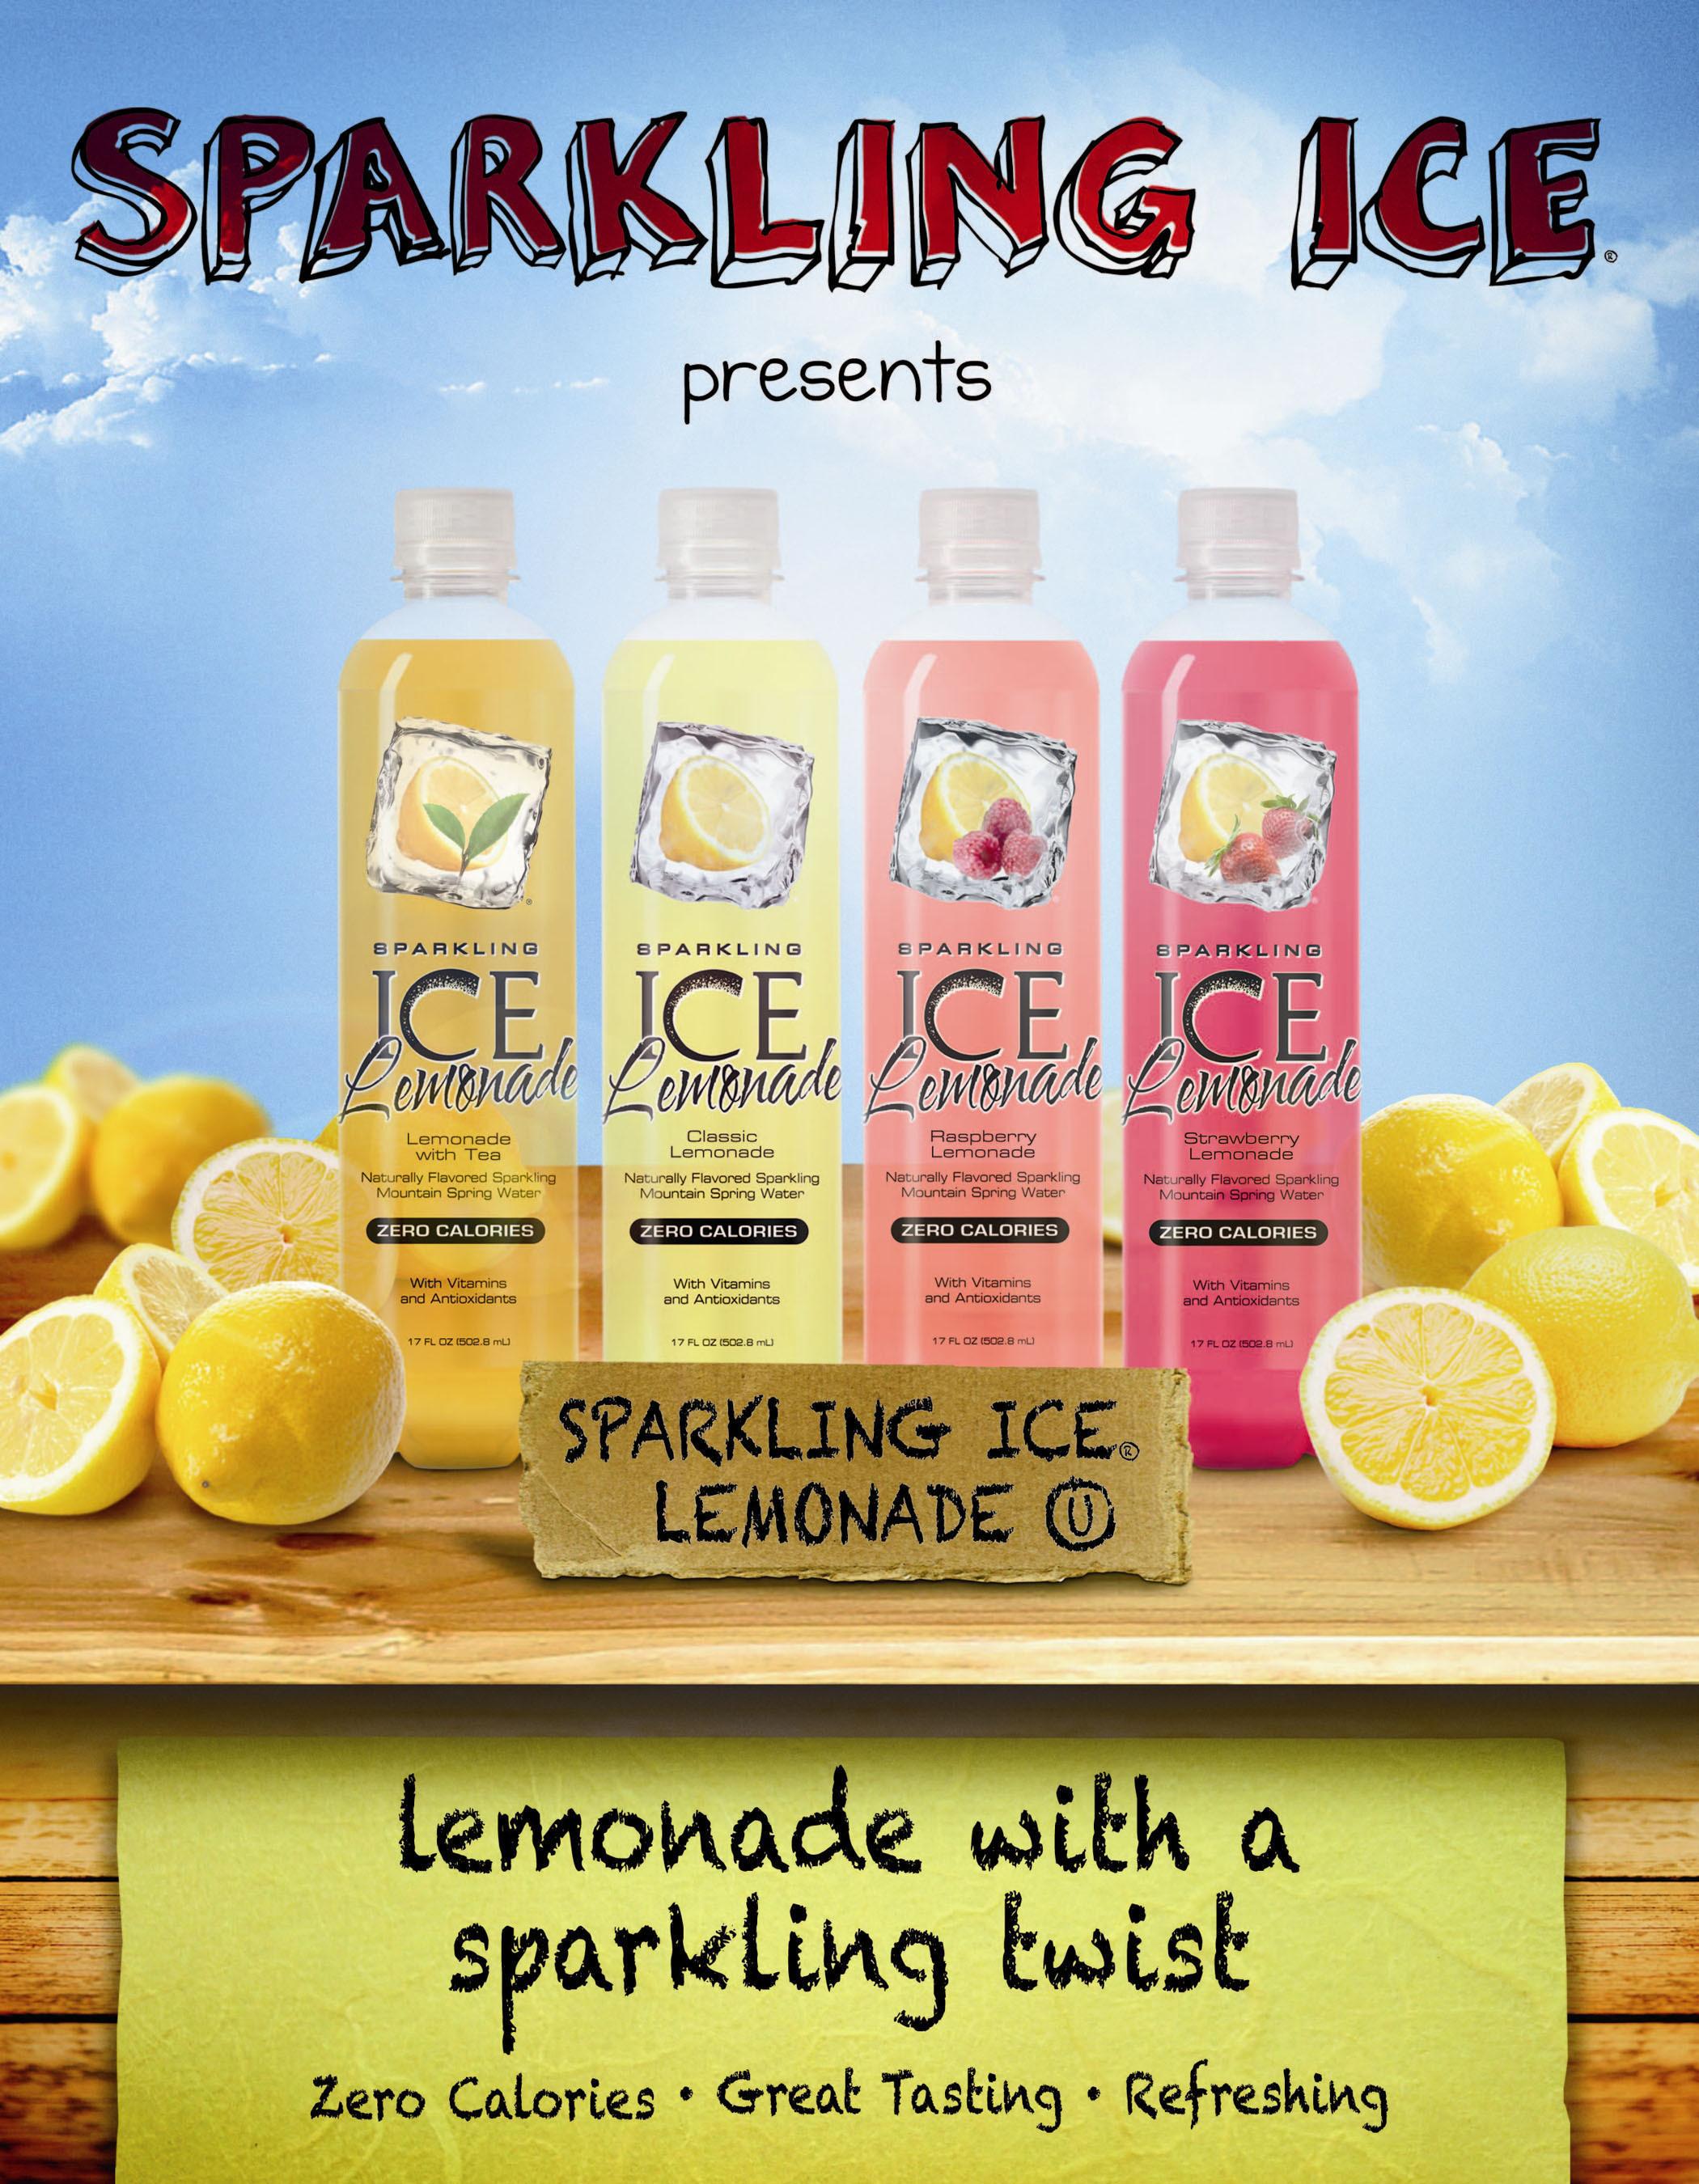 SPARKLING ICE SPARKLING LEMONADE